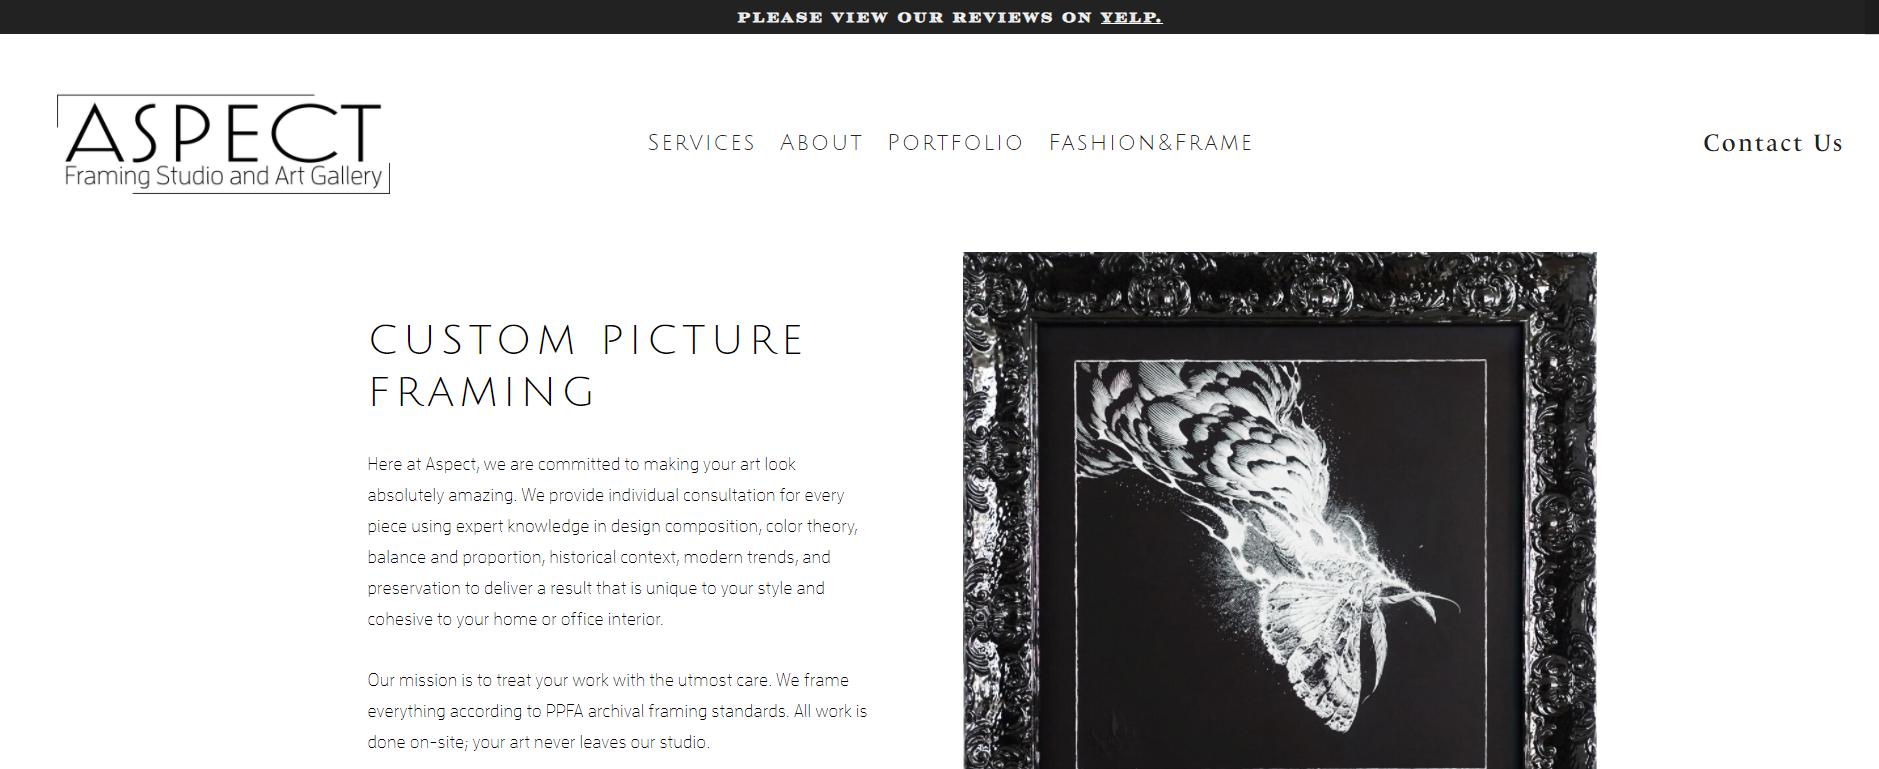 Aspect Framing Studio and Art Gallery